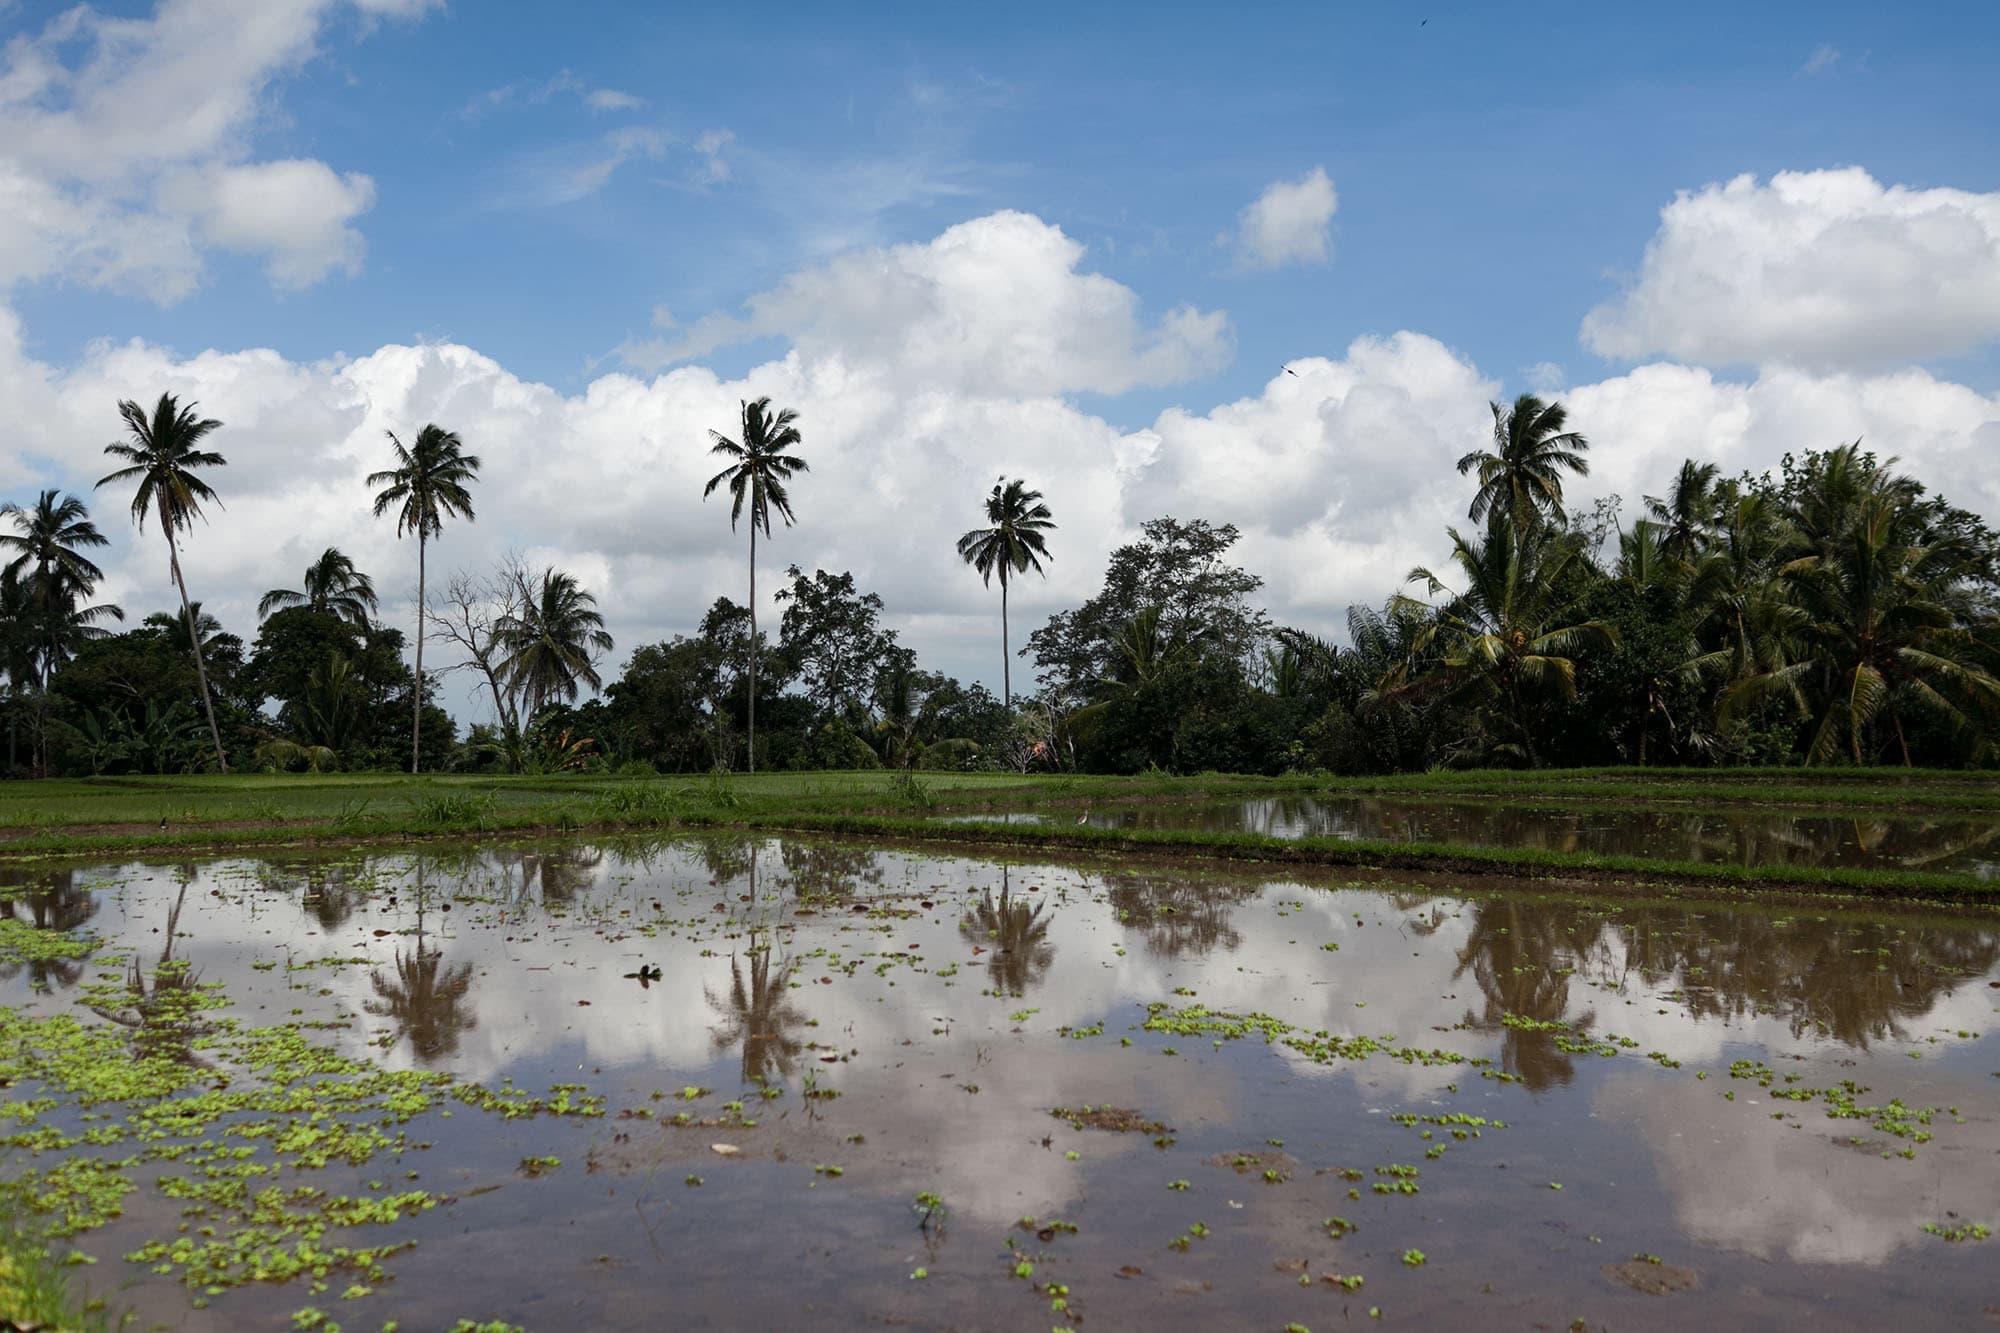 Hike through the rice paddies in Ubud, Bali, Indonesia.